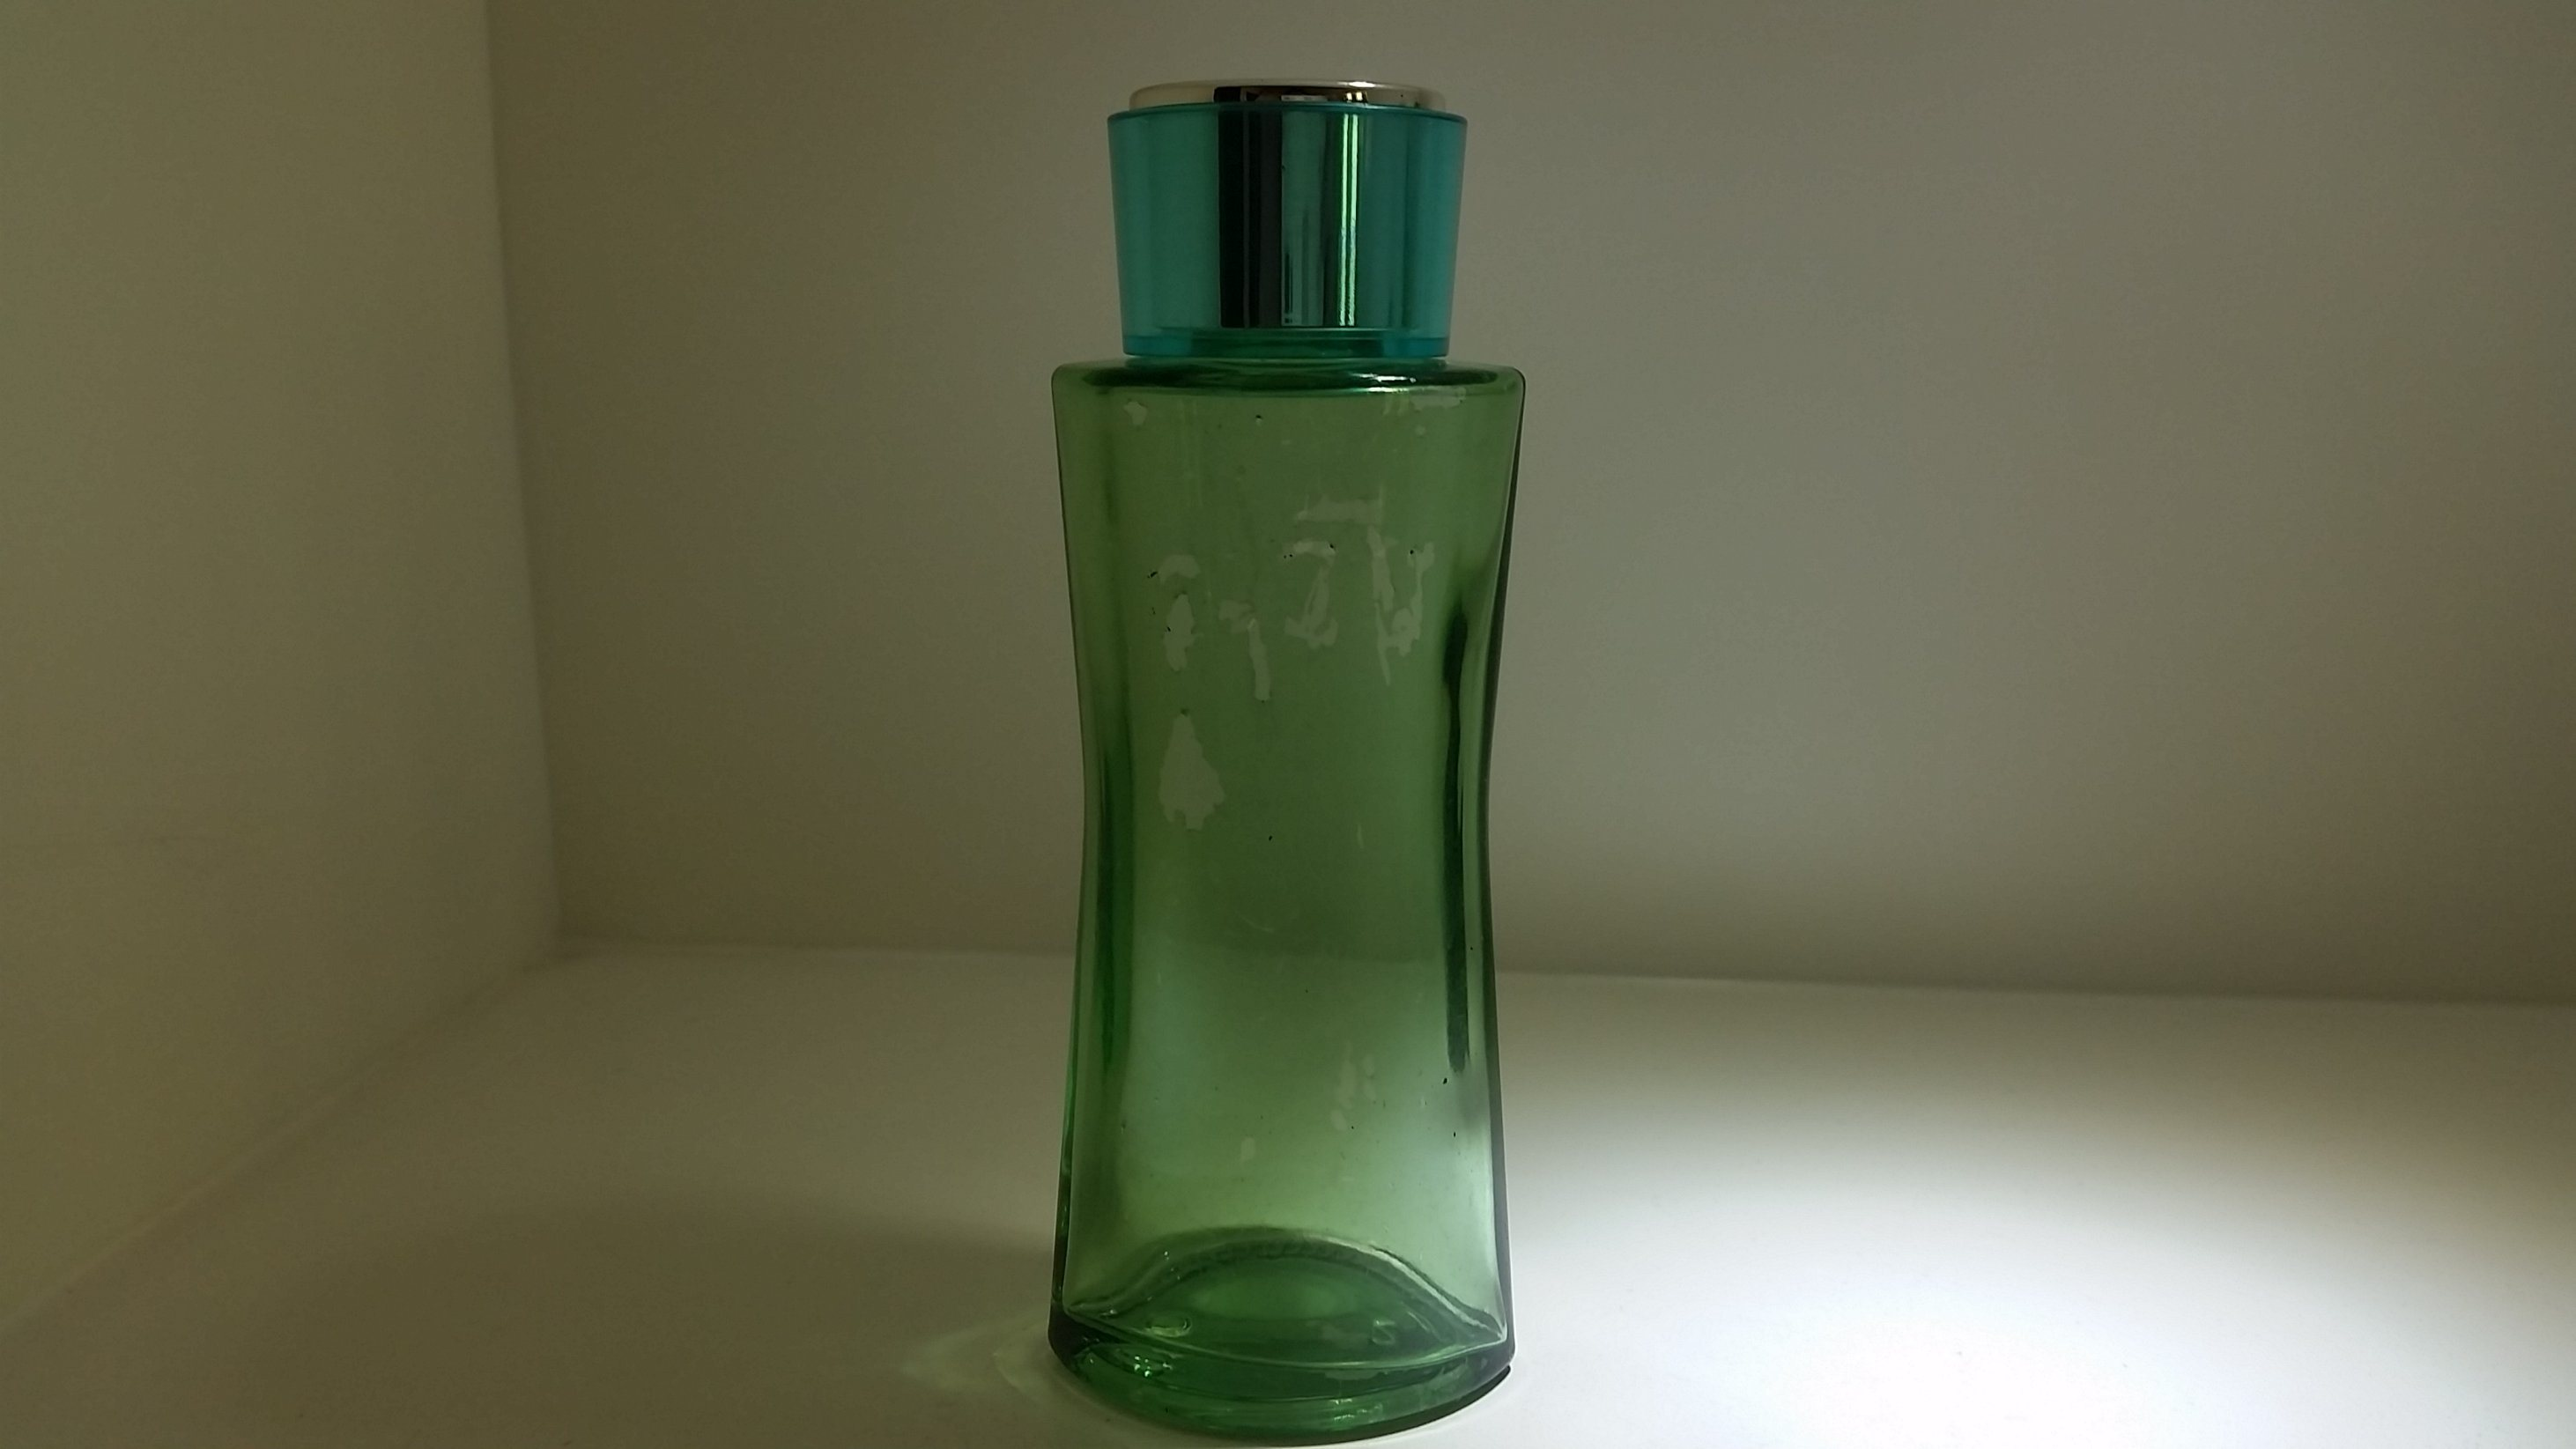 Qf-A3970 High Quality Glass Bottle